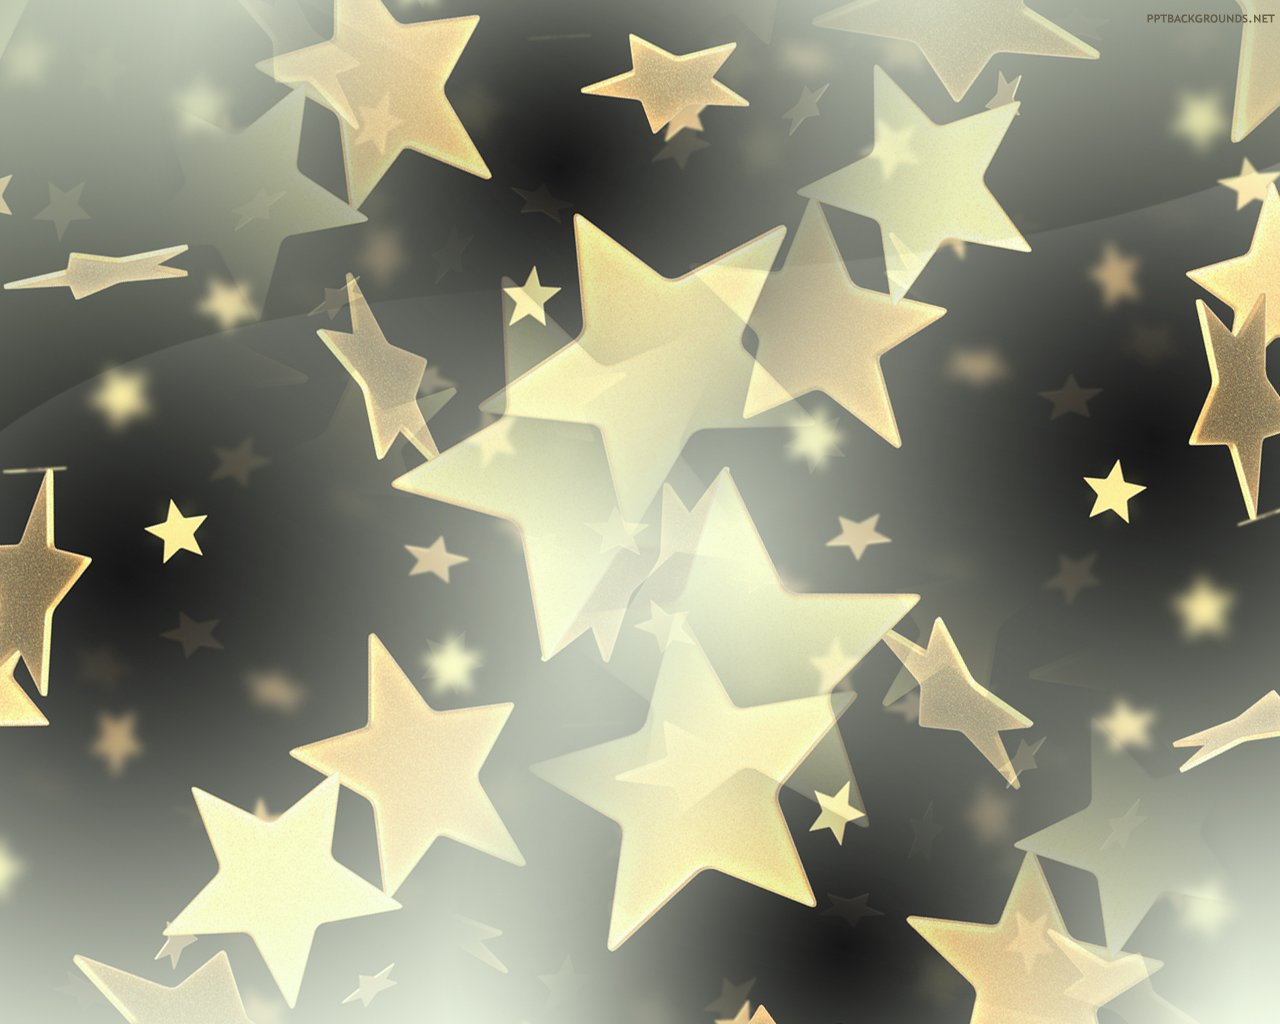 Картинки фонов для презентации со звездами